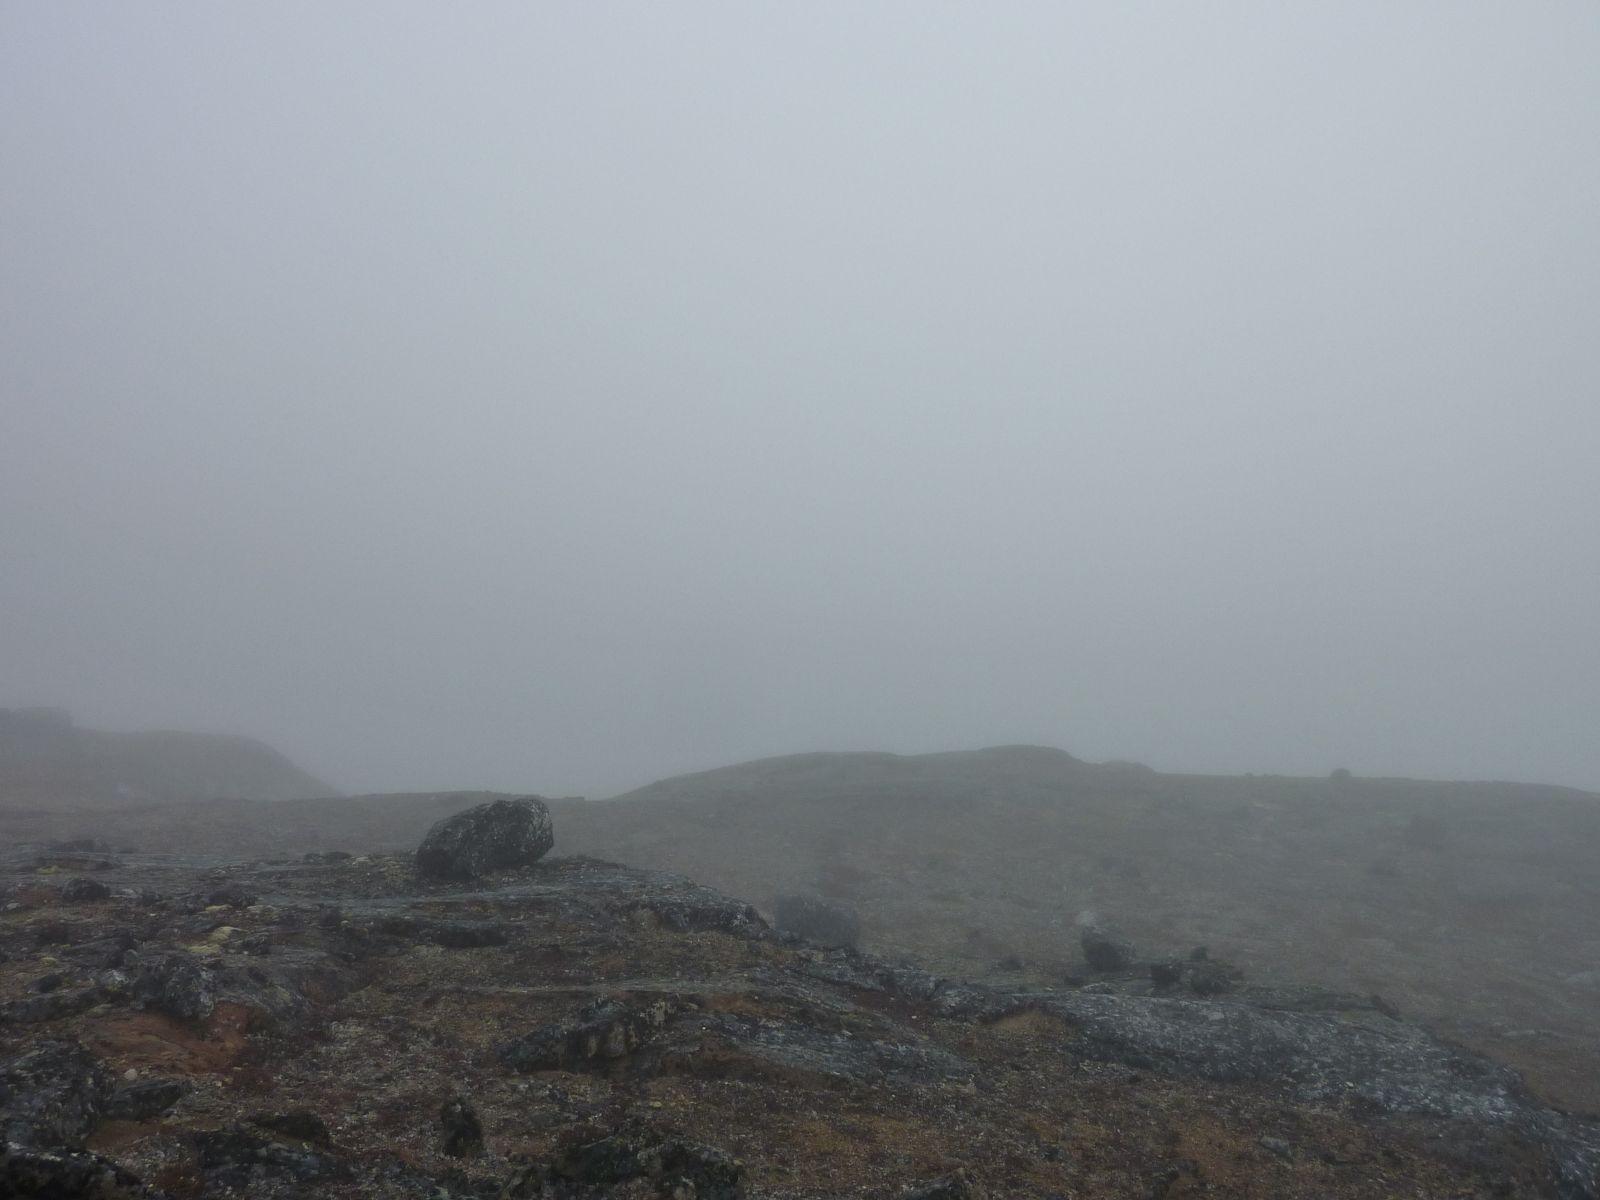 2010-10-15-1211_-_Cache; Tåge